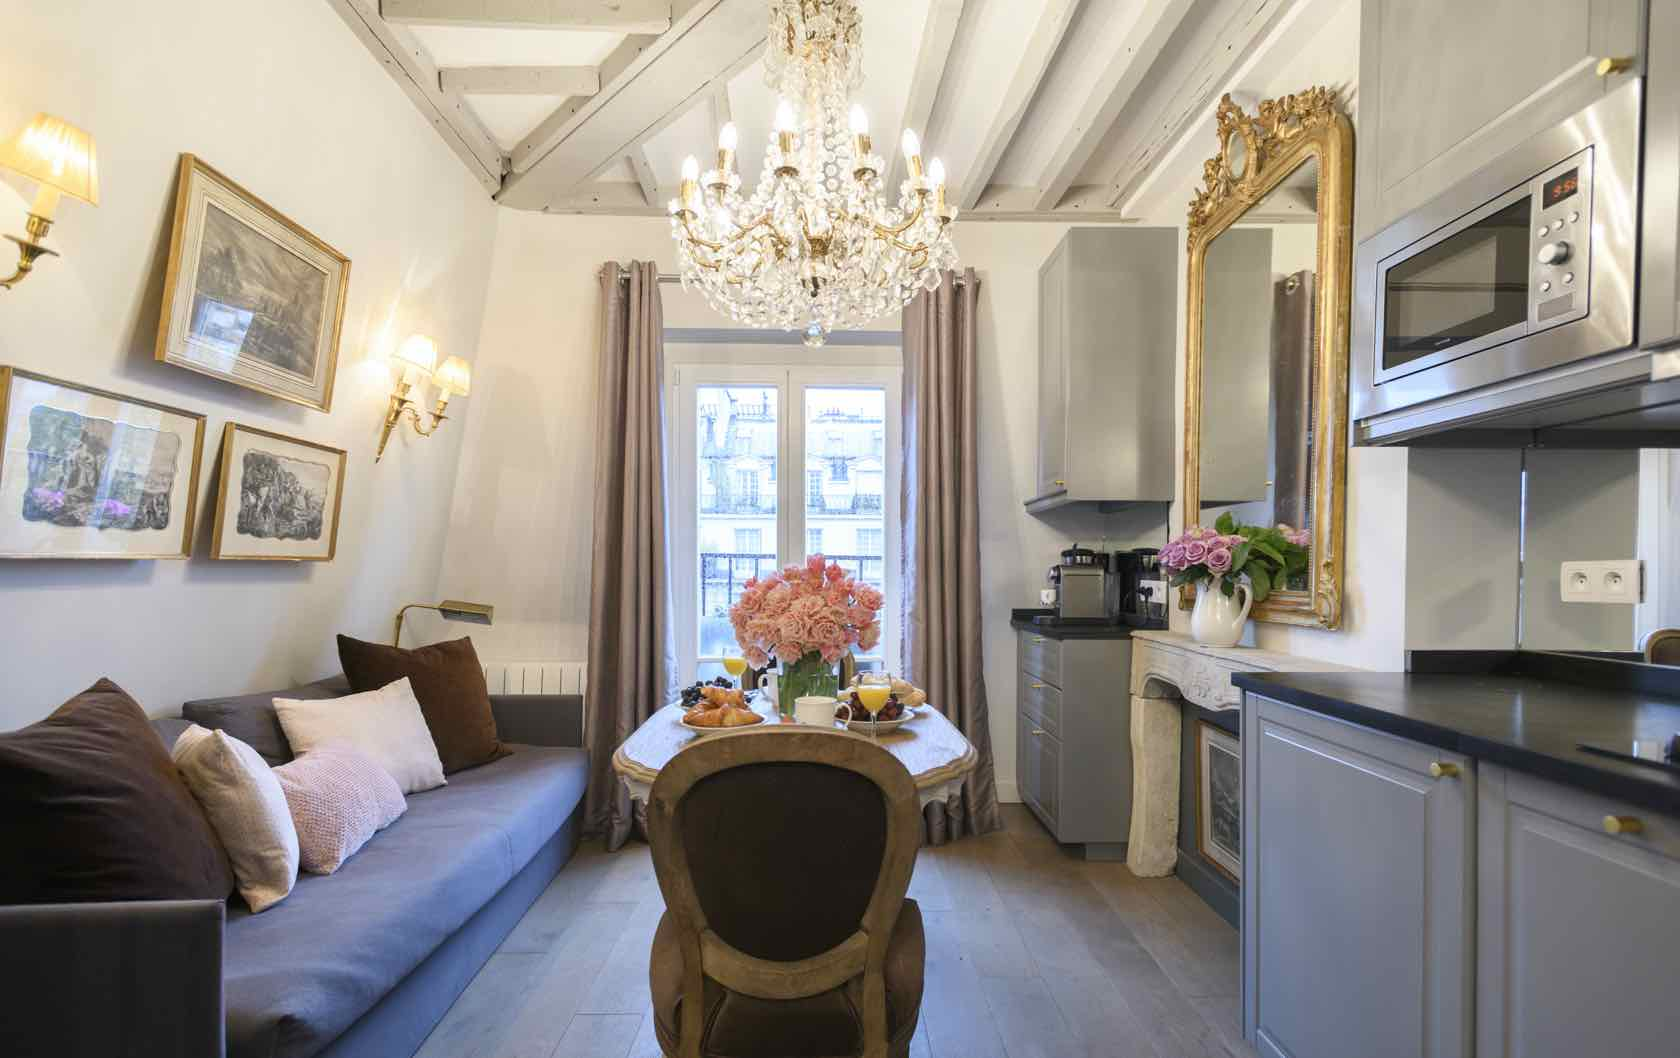 Cremant studio apartment from Paris Perfect Shared